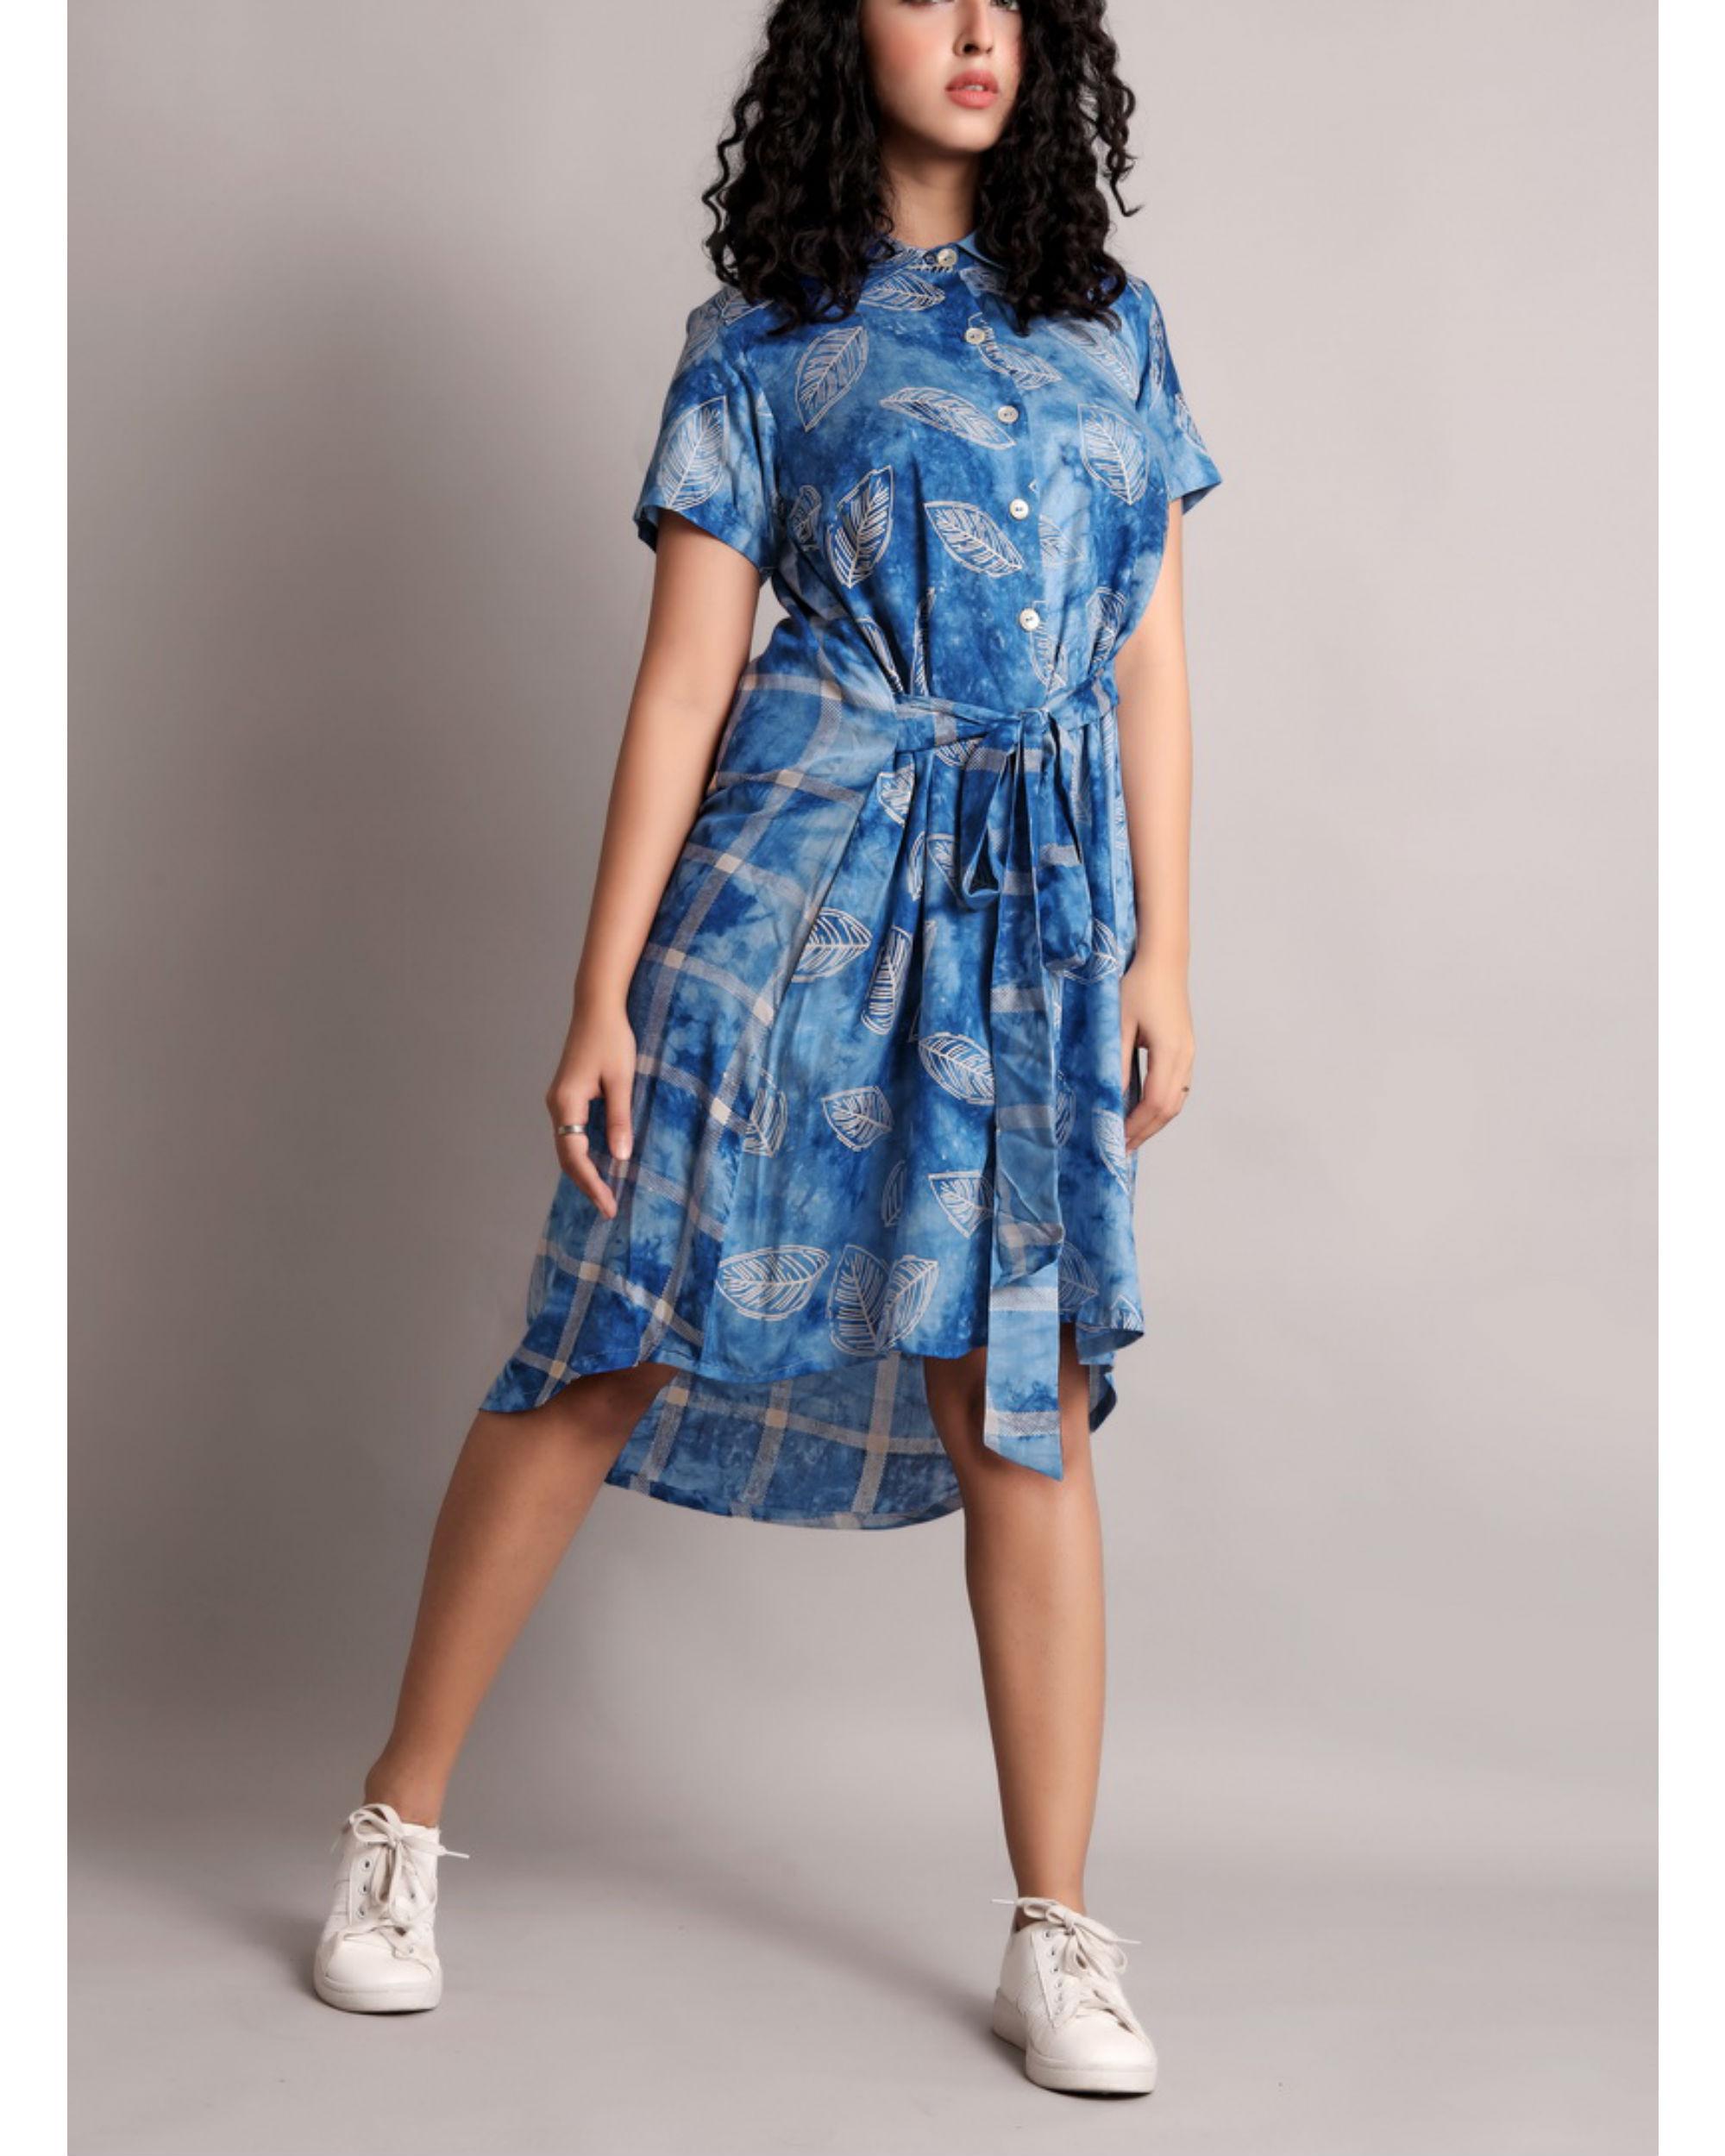 Blue half and half front tie-up dress